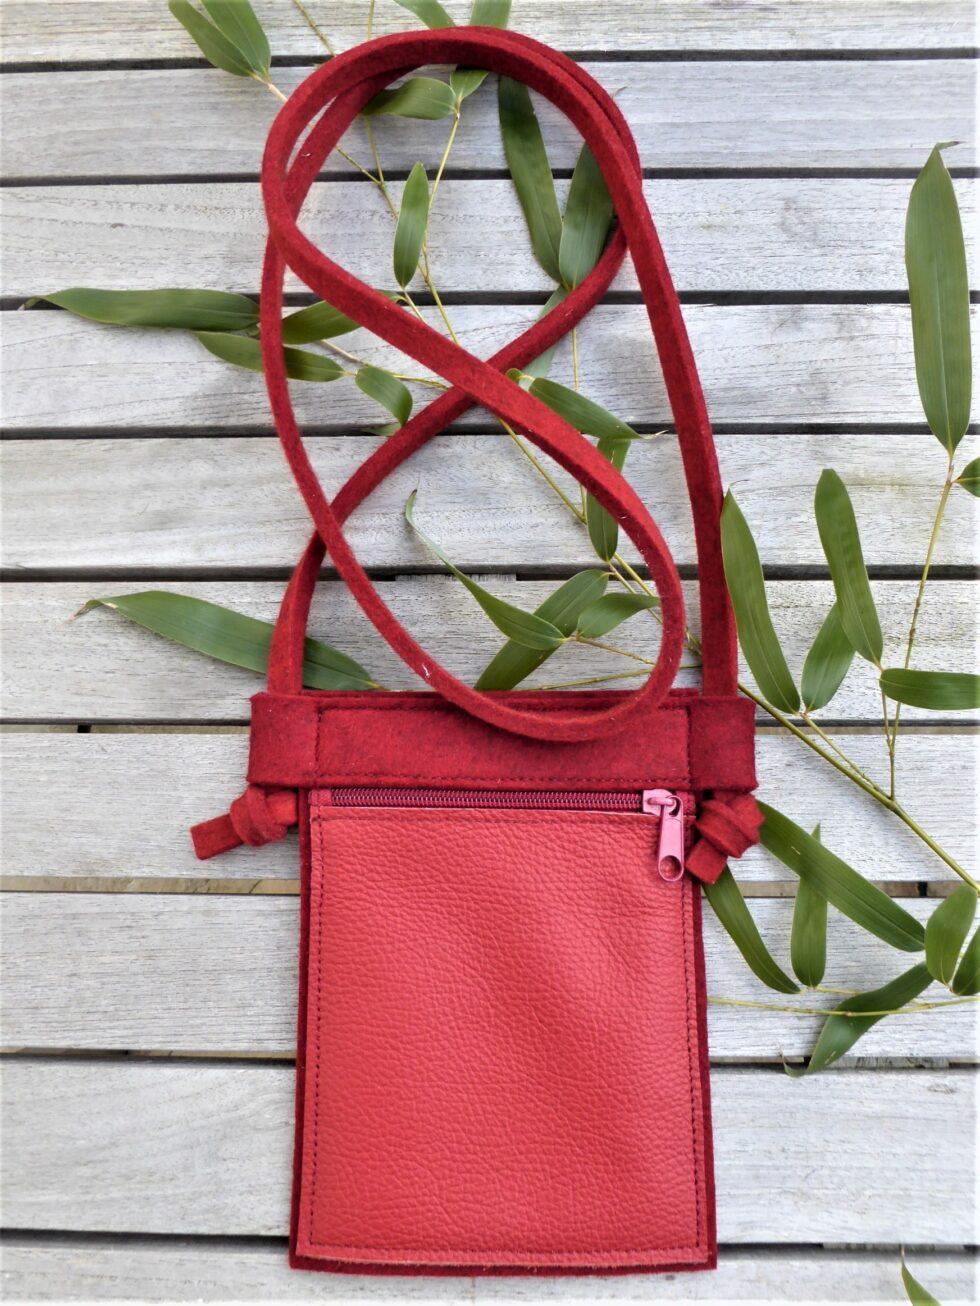 Smartphonetasche, Aggi Varnholt, Taschenmanufaktur, natürlich, nachhaltig, aggi-varnholt.de